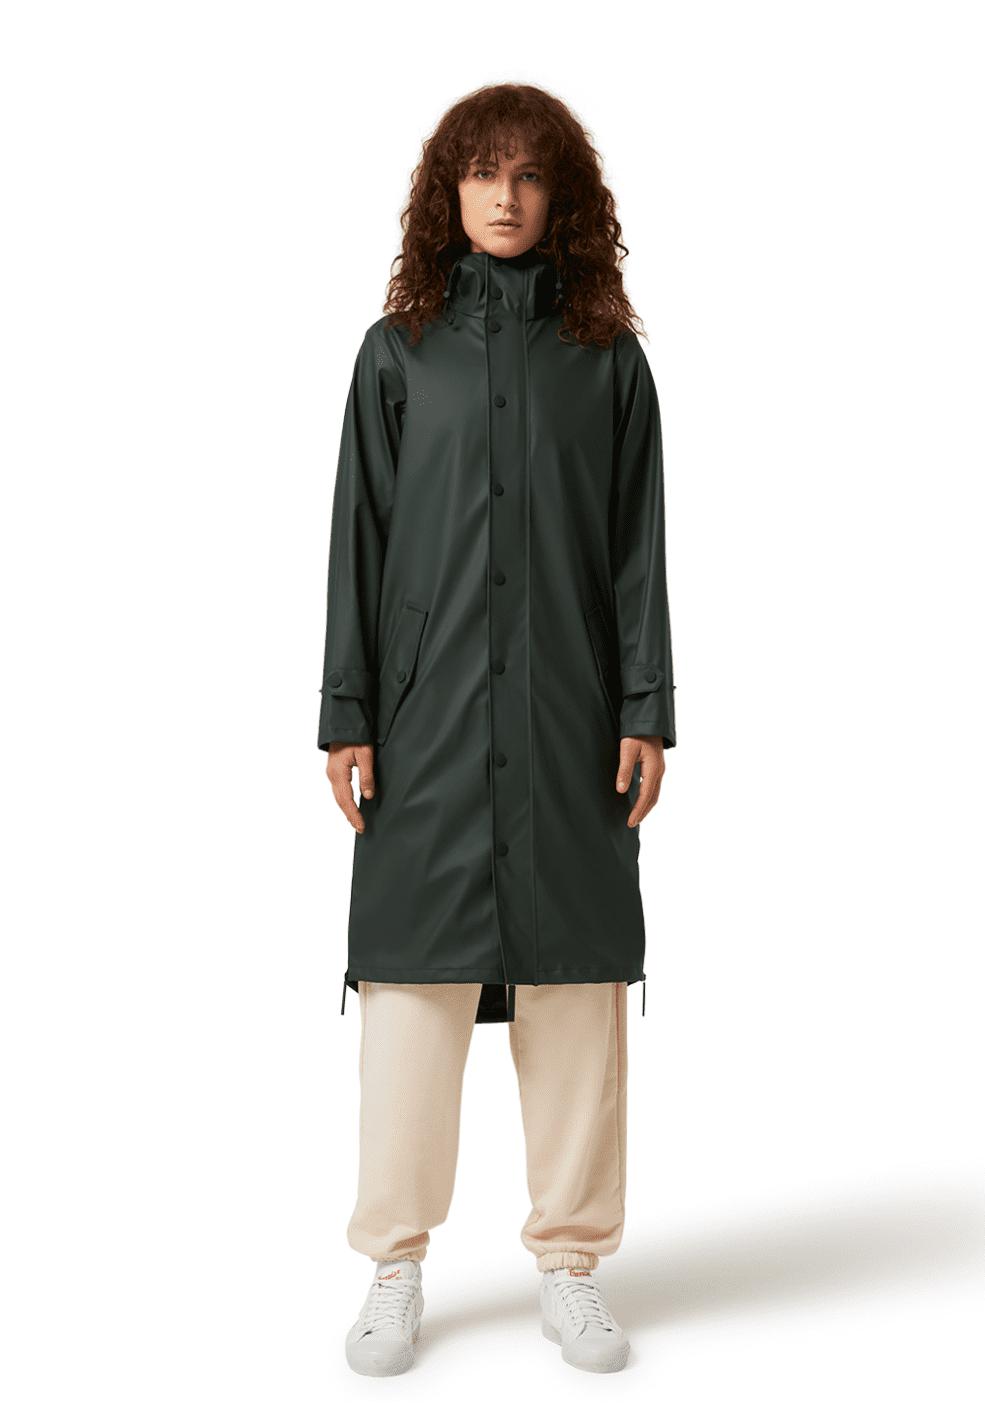 Unisex Original Recycled Rain Coat Deep Forest